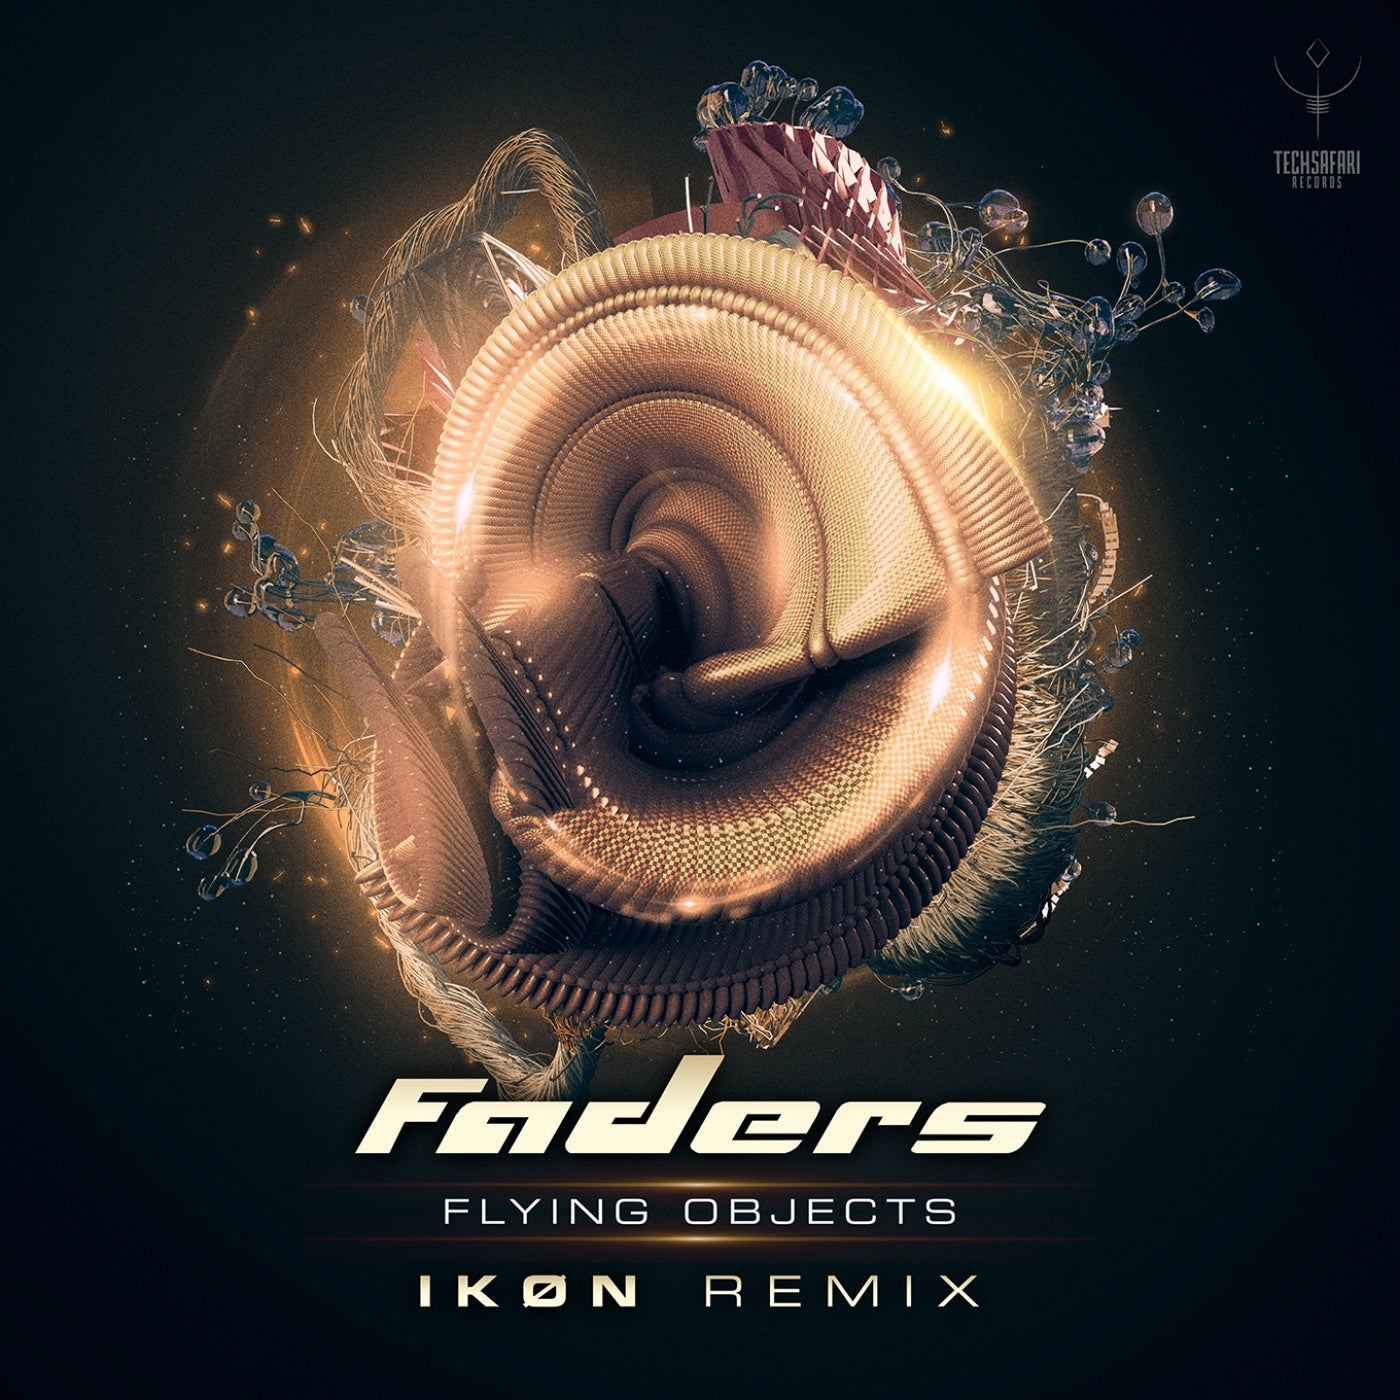 Flying Objects (Ikon Remix)